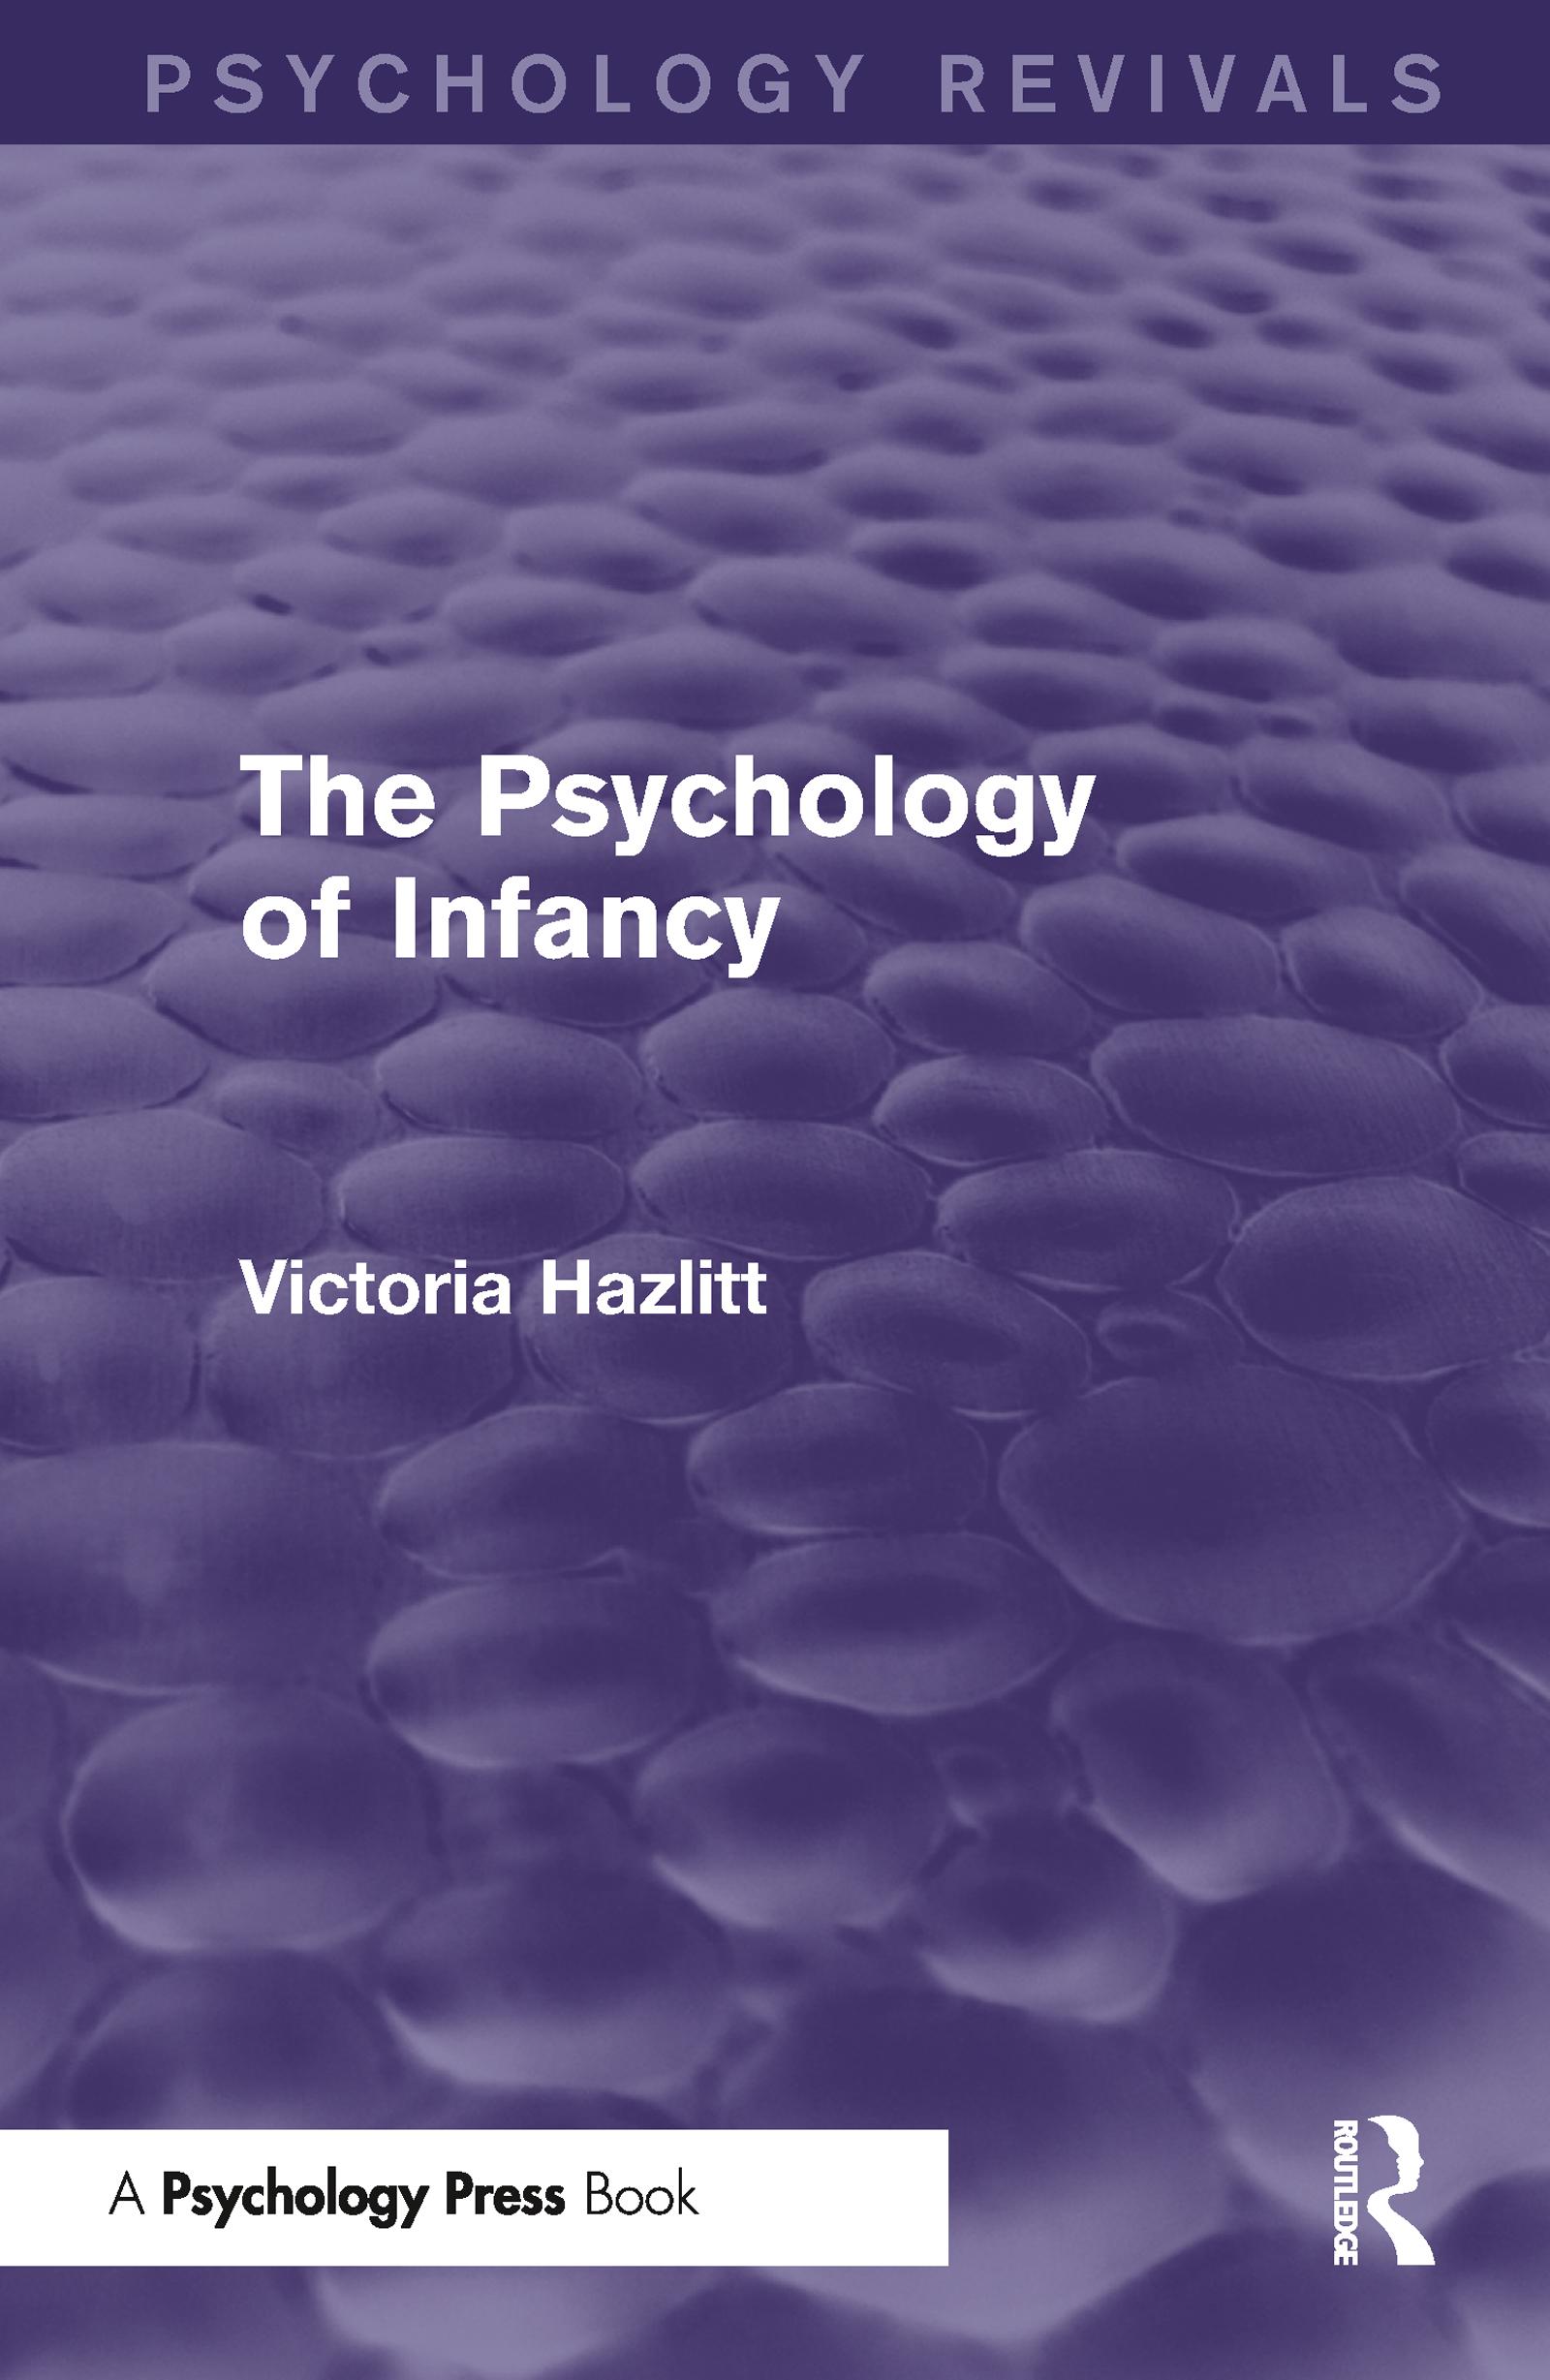 The Psychology of Infancy (Psychology Revivals)